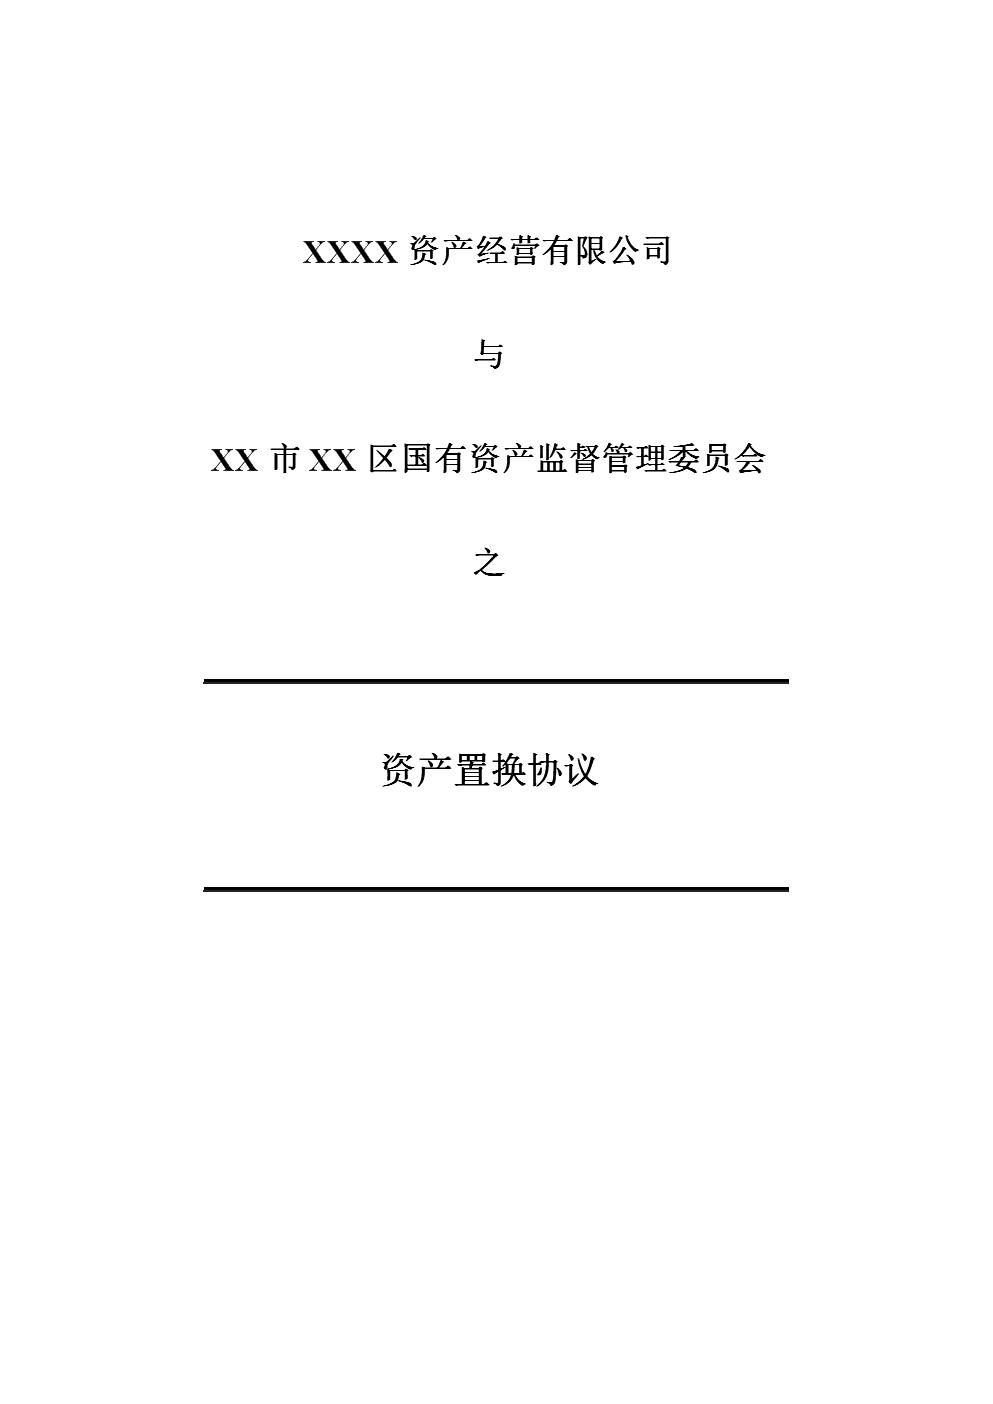 XX资产经营有限公司资产置换协议.doc